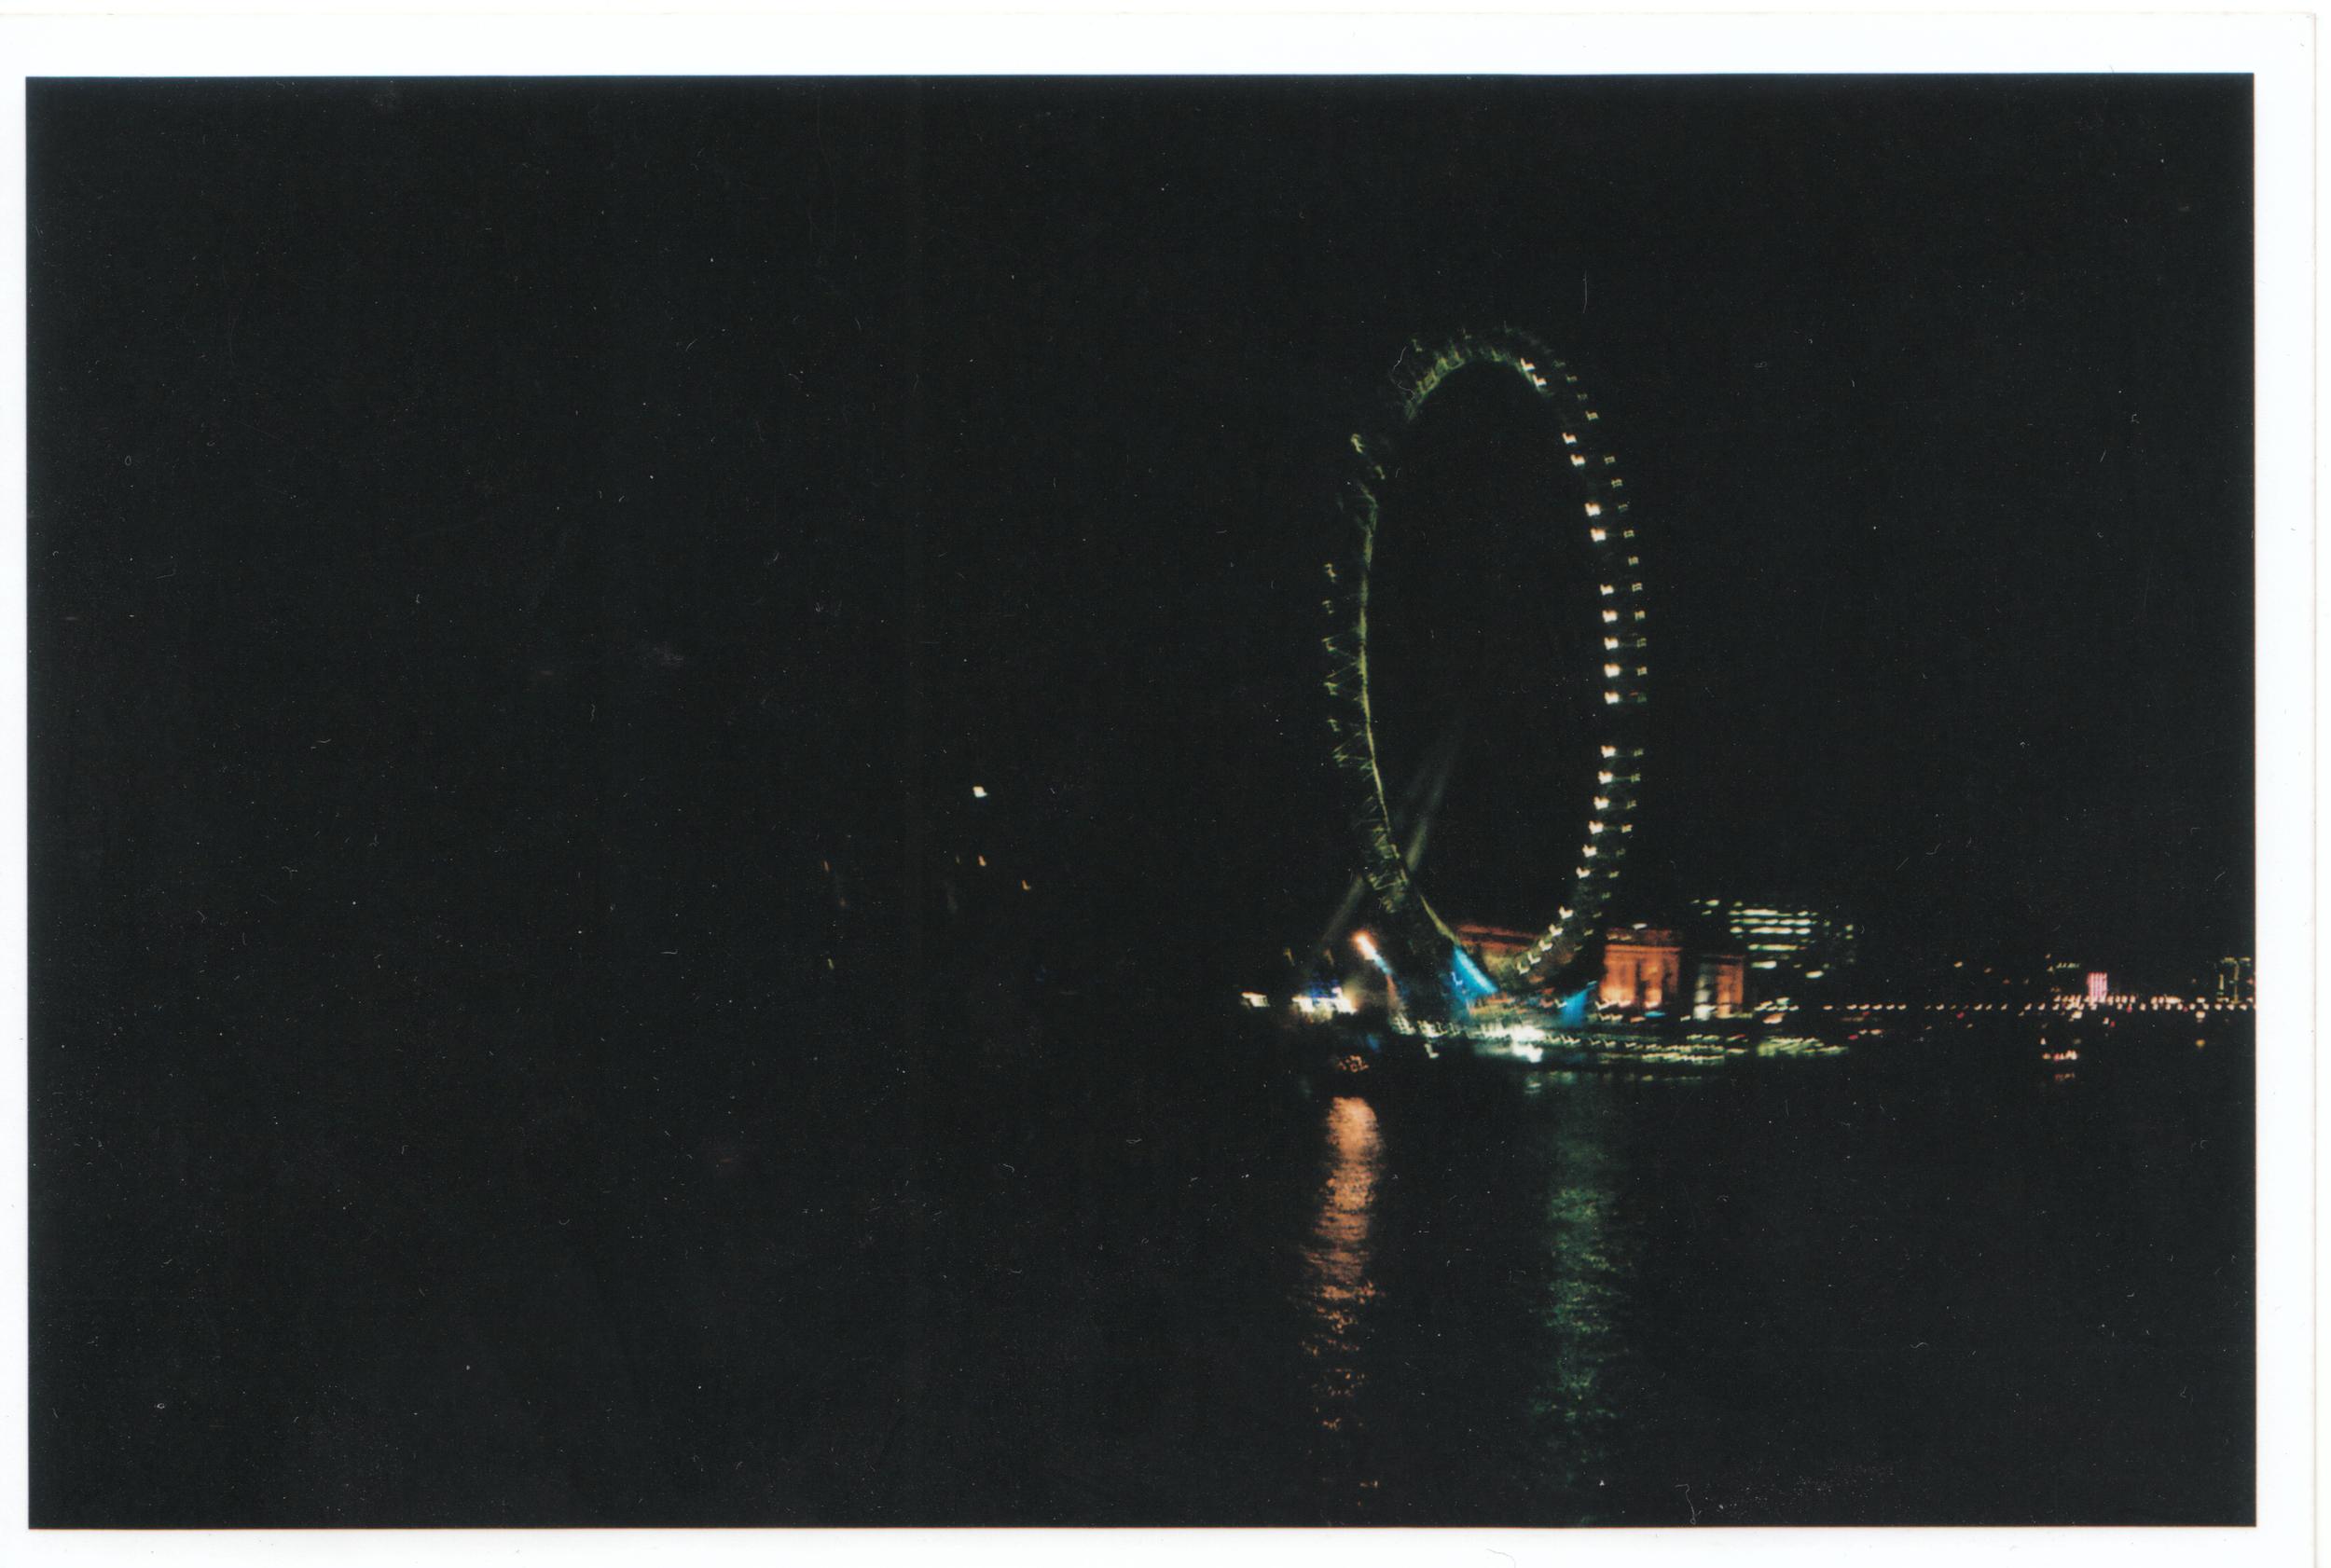 A London Blurry Night